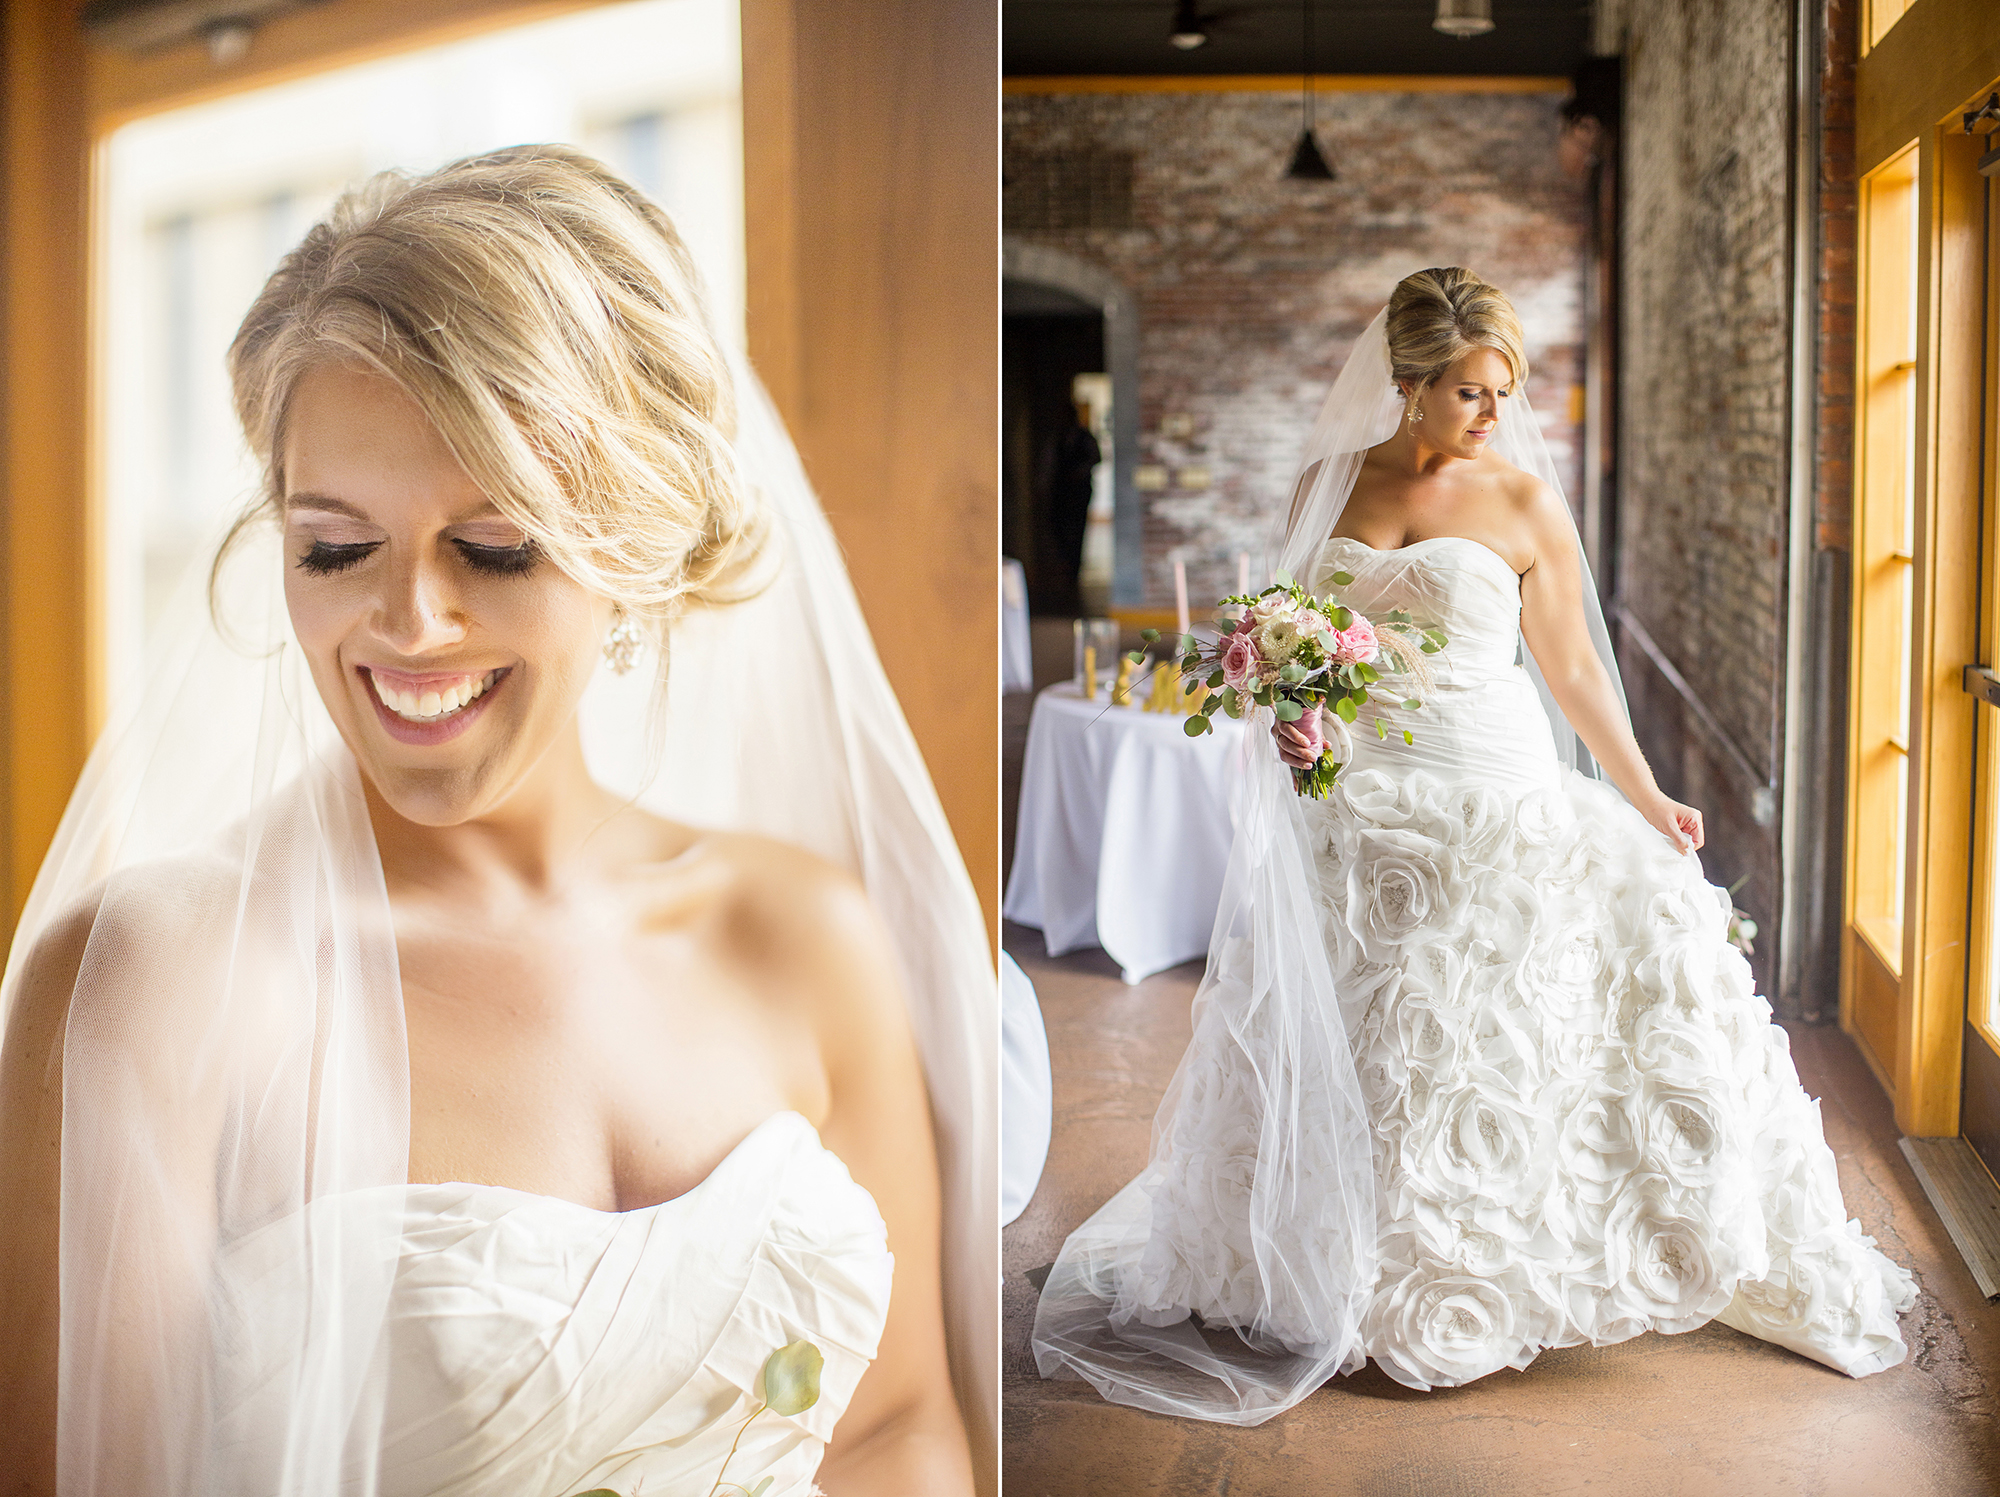 Seriously_Sabrina_Photography_Ashland_Kentucky_Train_Depot_Wedding_Parsons15.jpg